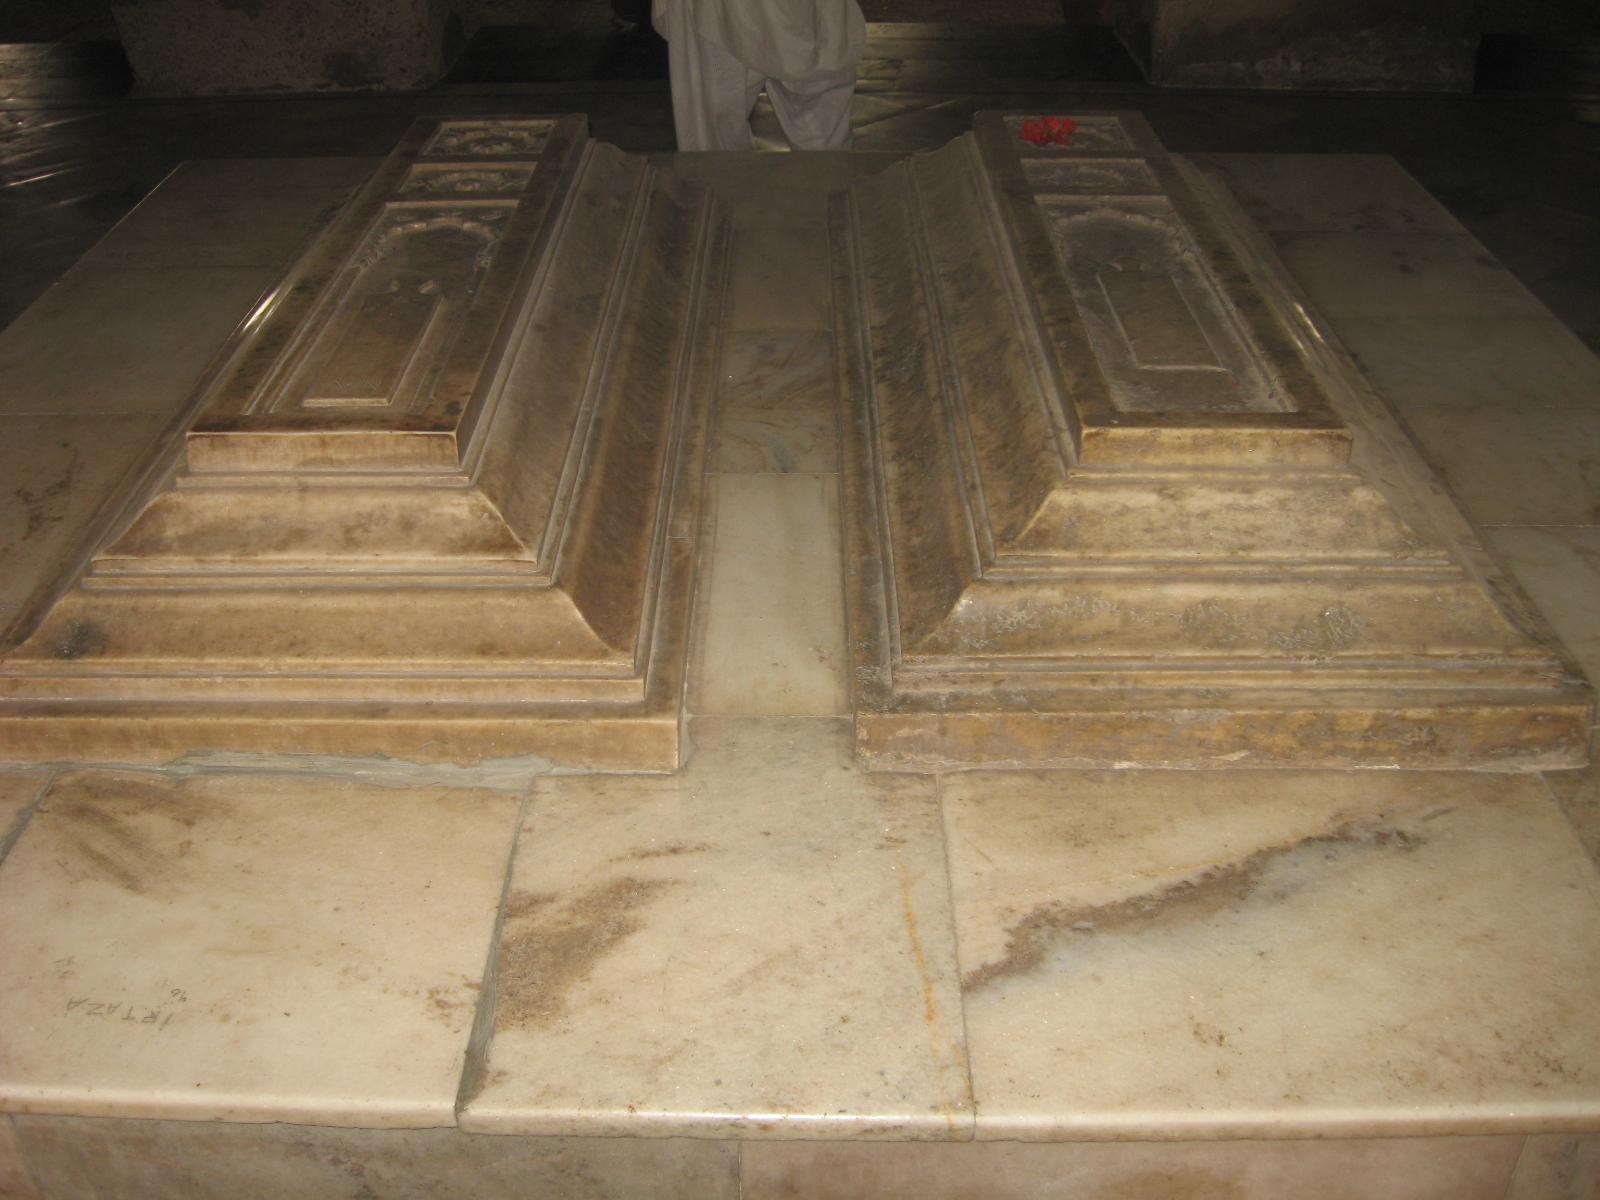 Cenotaph_Tomb_of_Nur_Jahan